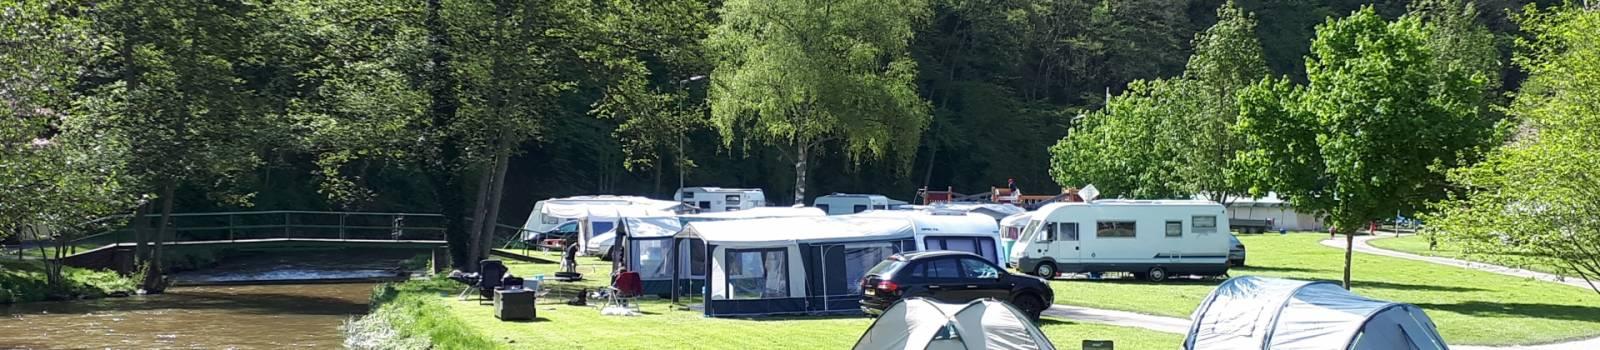 meivakantie 2018 camping kautenbach 3